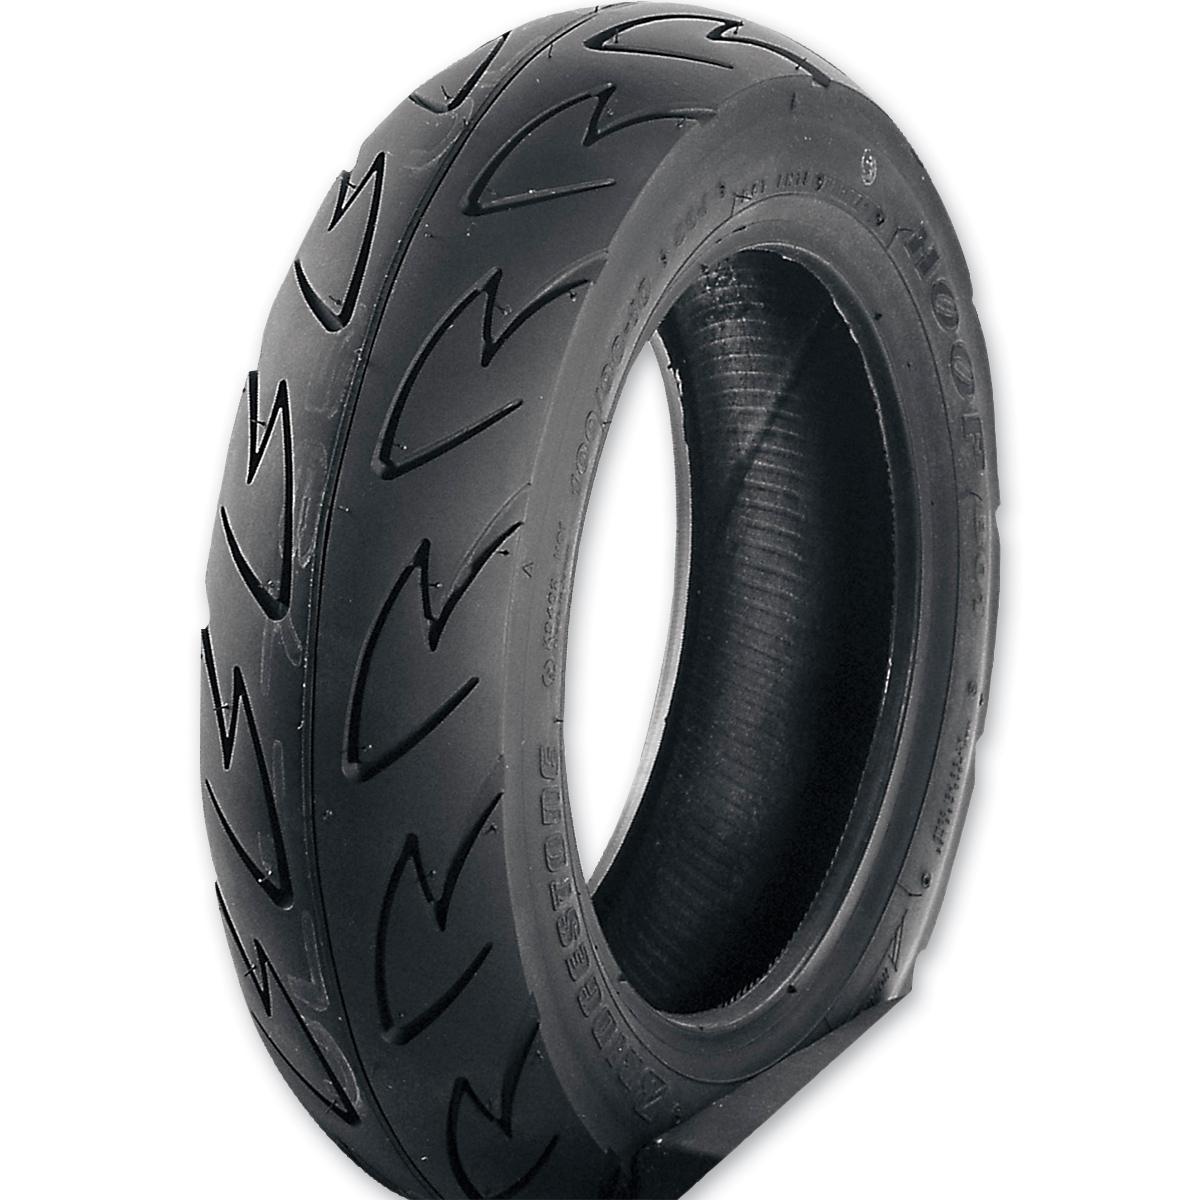 Bridgestone B03-G HOOP 110/90-13 Front Tire